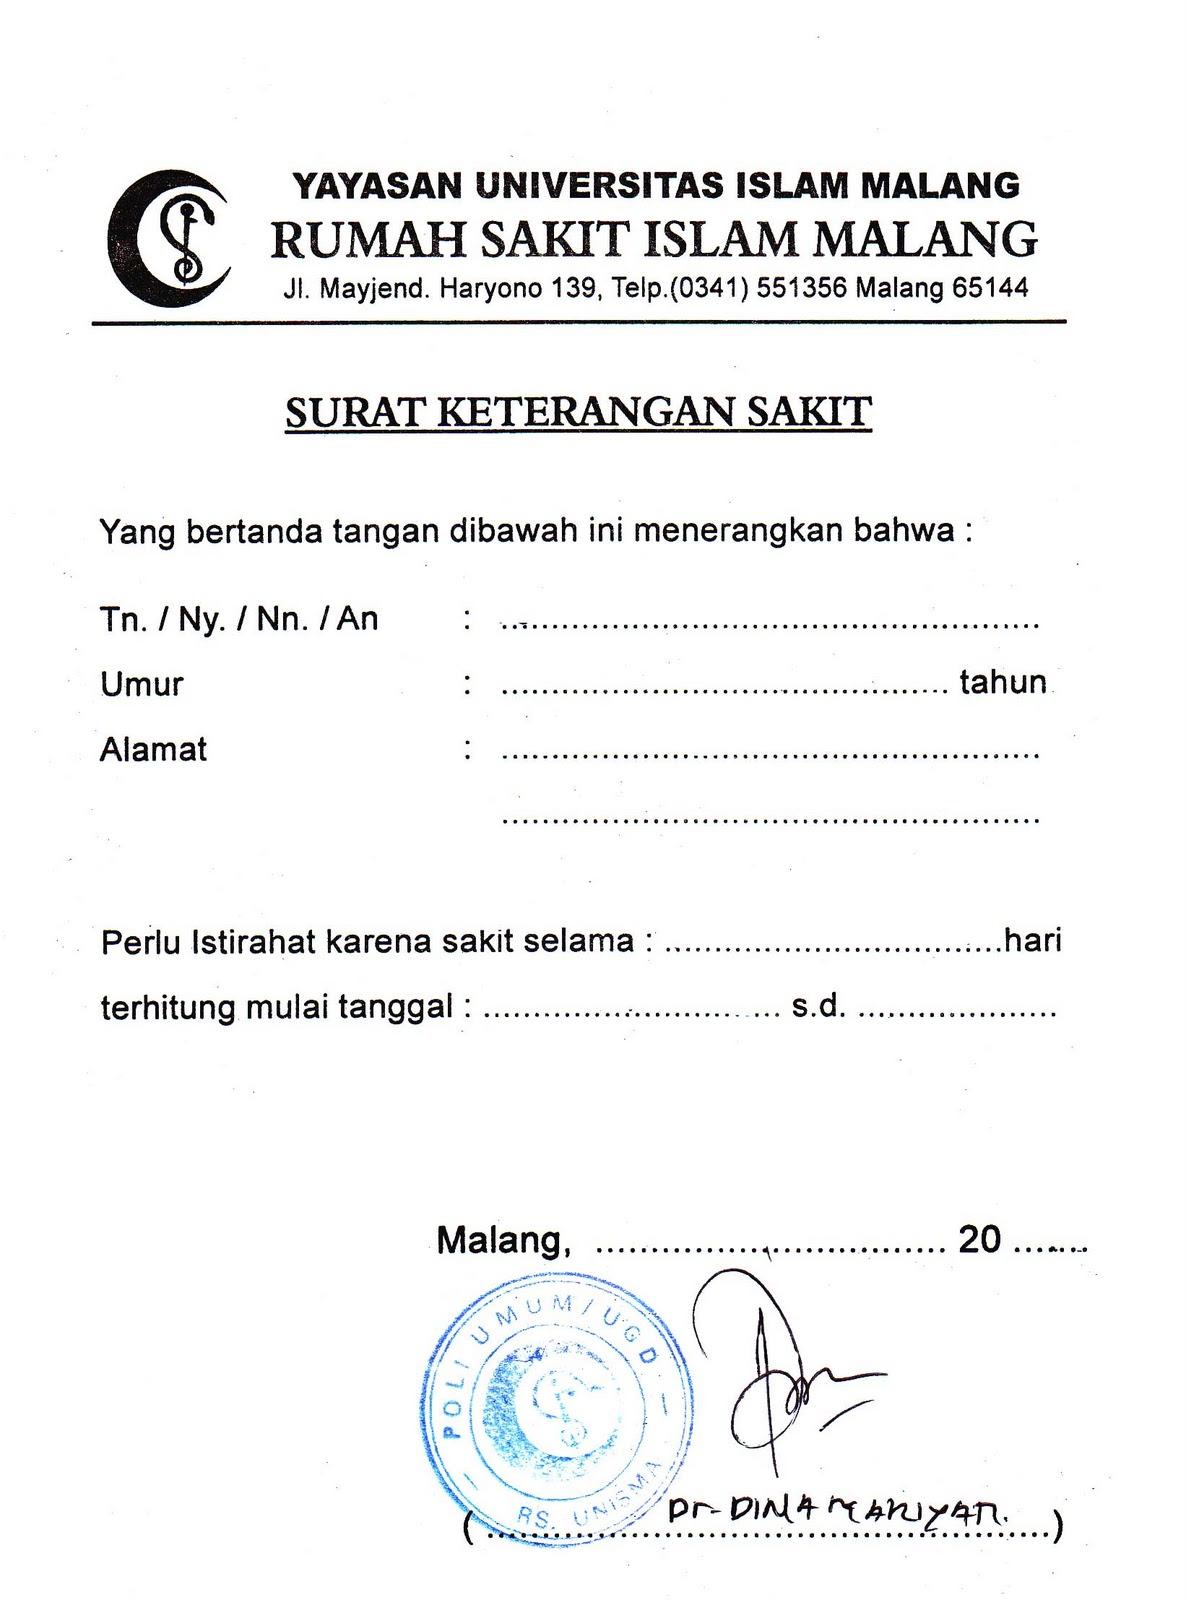 Contoh Surat Dokter Di Malang Surat 29